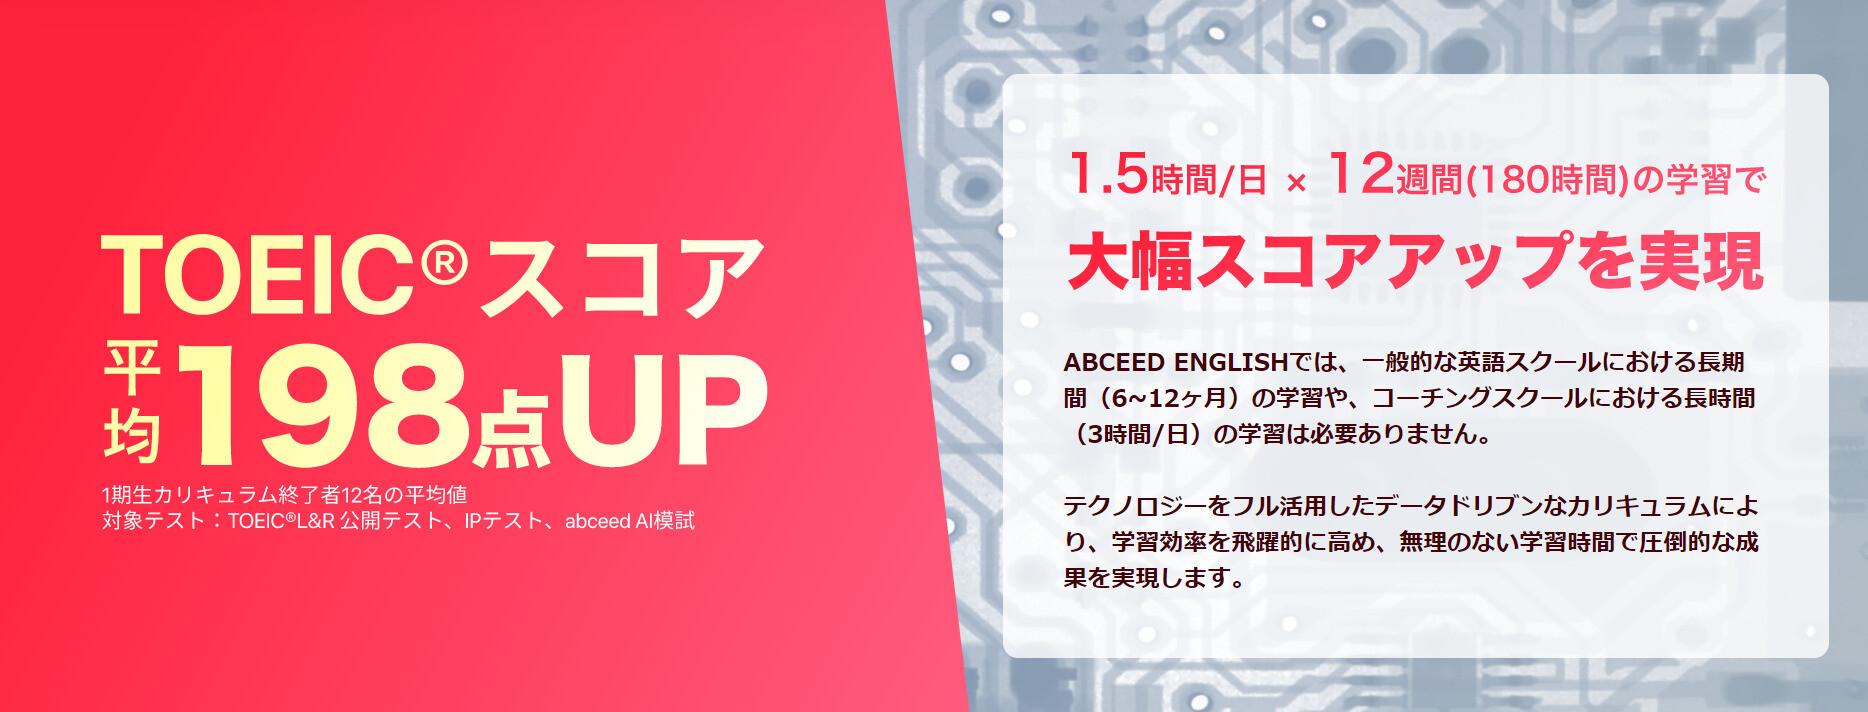 ABCEED ENGLISHにおける学習時間とスコアアップ実績